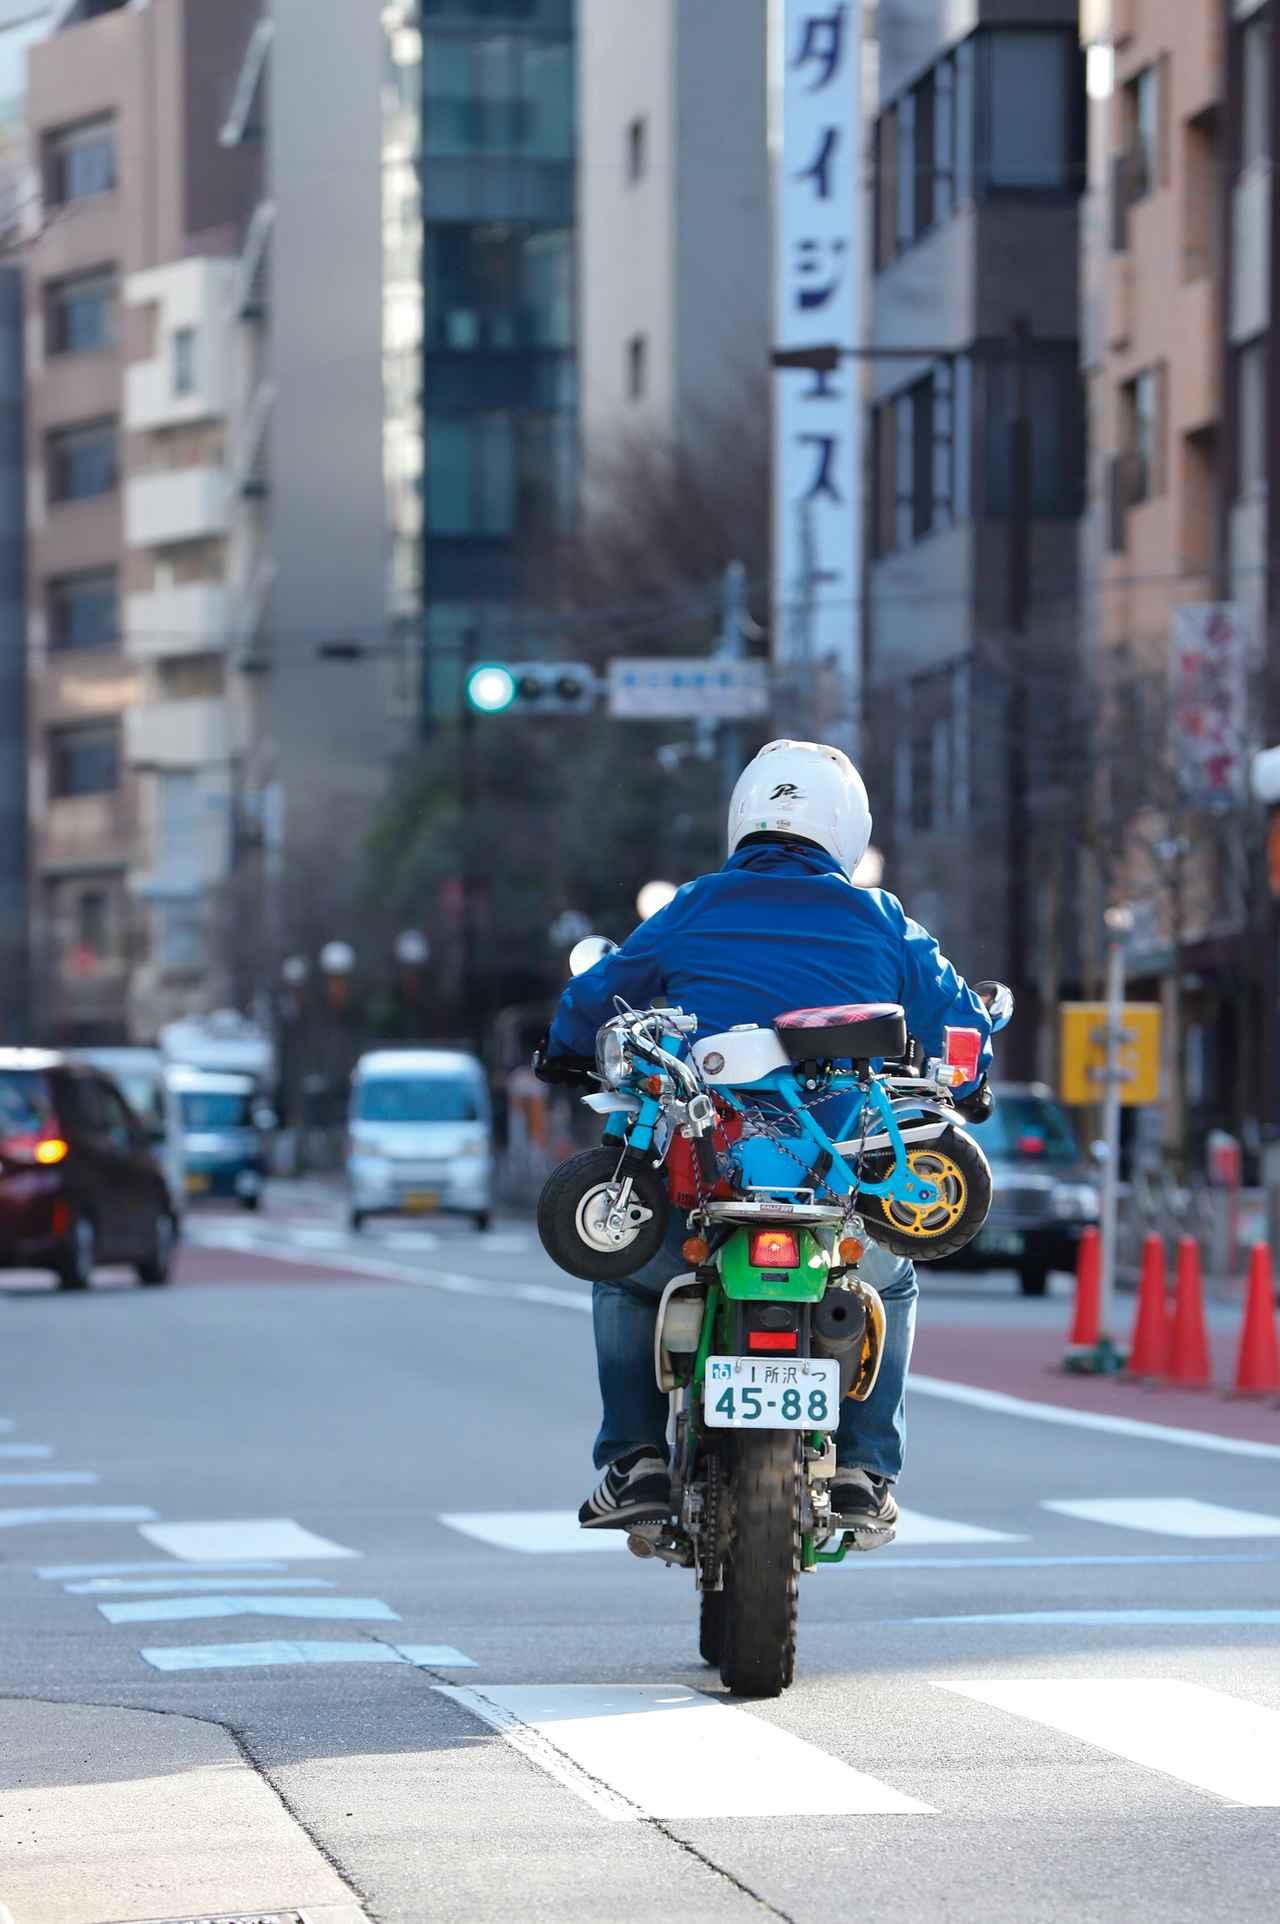 Images : 6番目の画像 - 「世界最小のキットバイク仔猿で走ろう‼ 試乗編「仔猿遊び・その3(全3回)」」のアルバム - webオートバイ